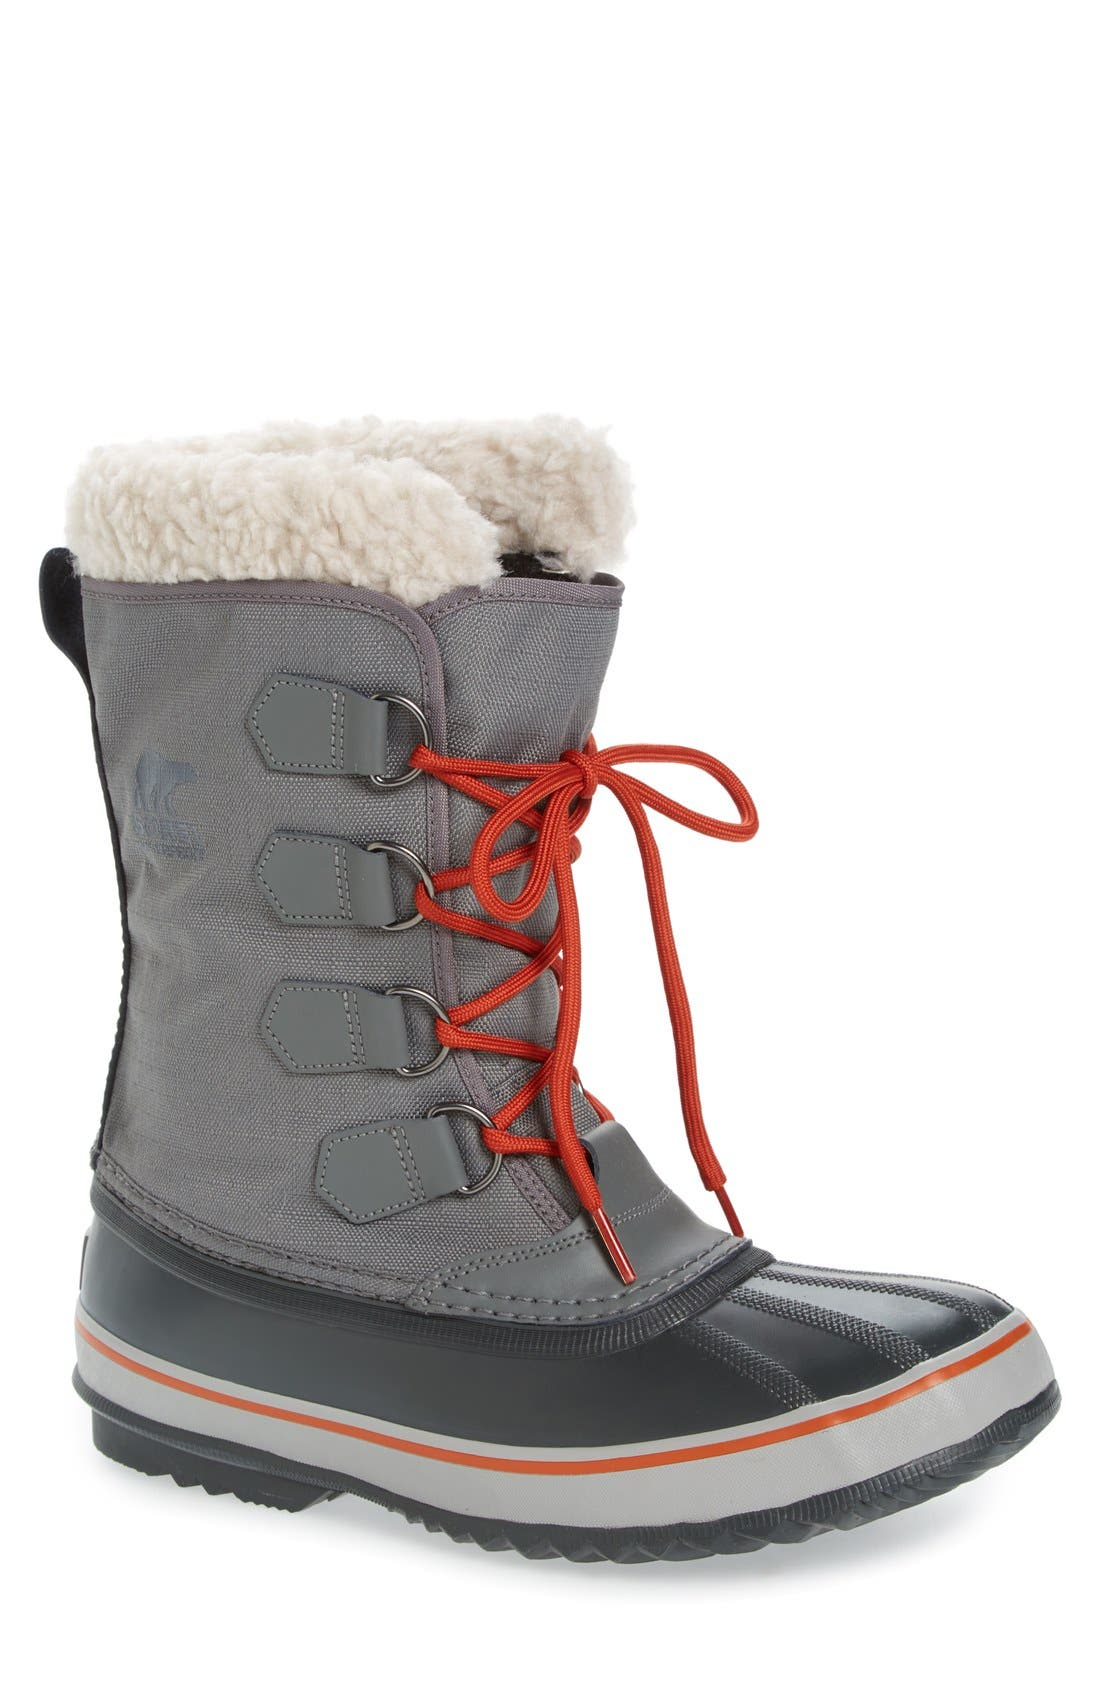 '1964 PAC' Snow Boot,                         Main,                         color, Dark Fog/ Shark Grey